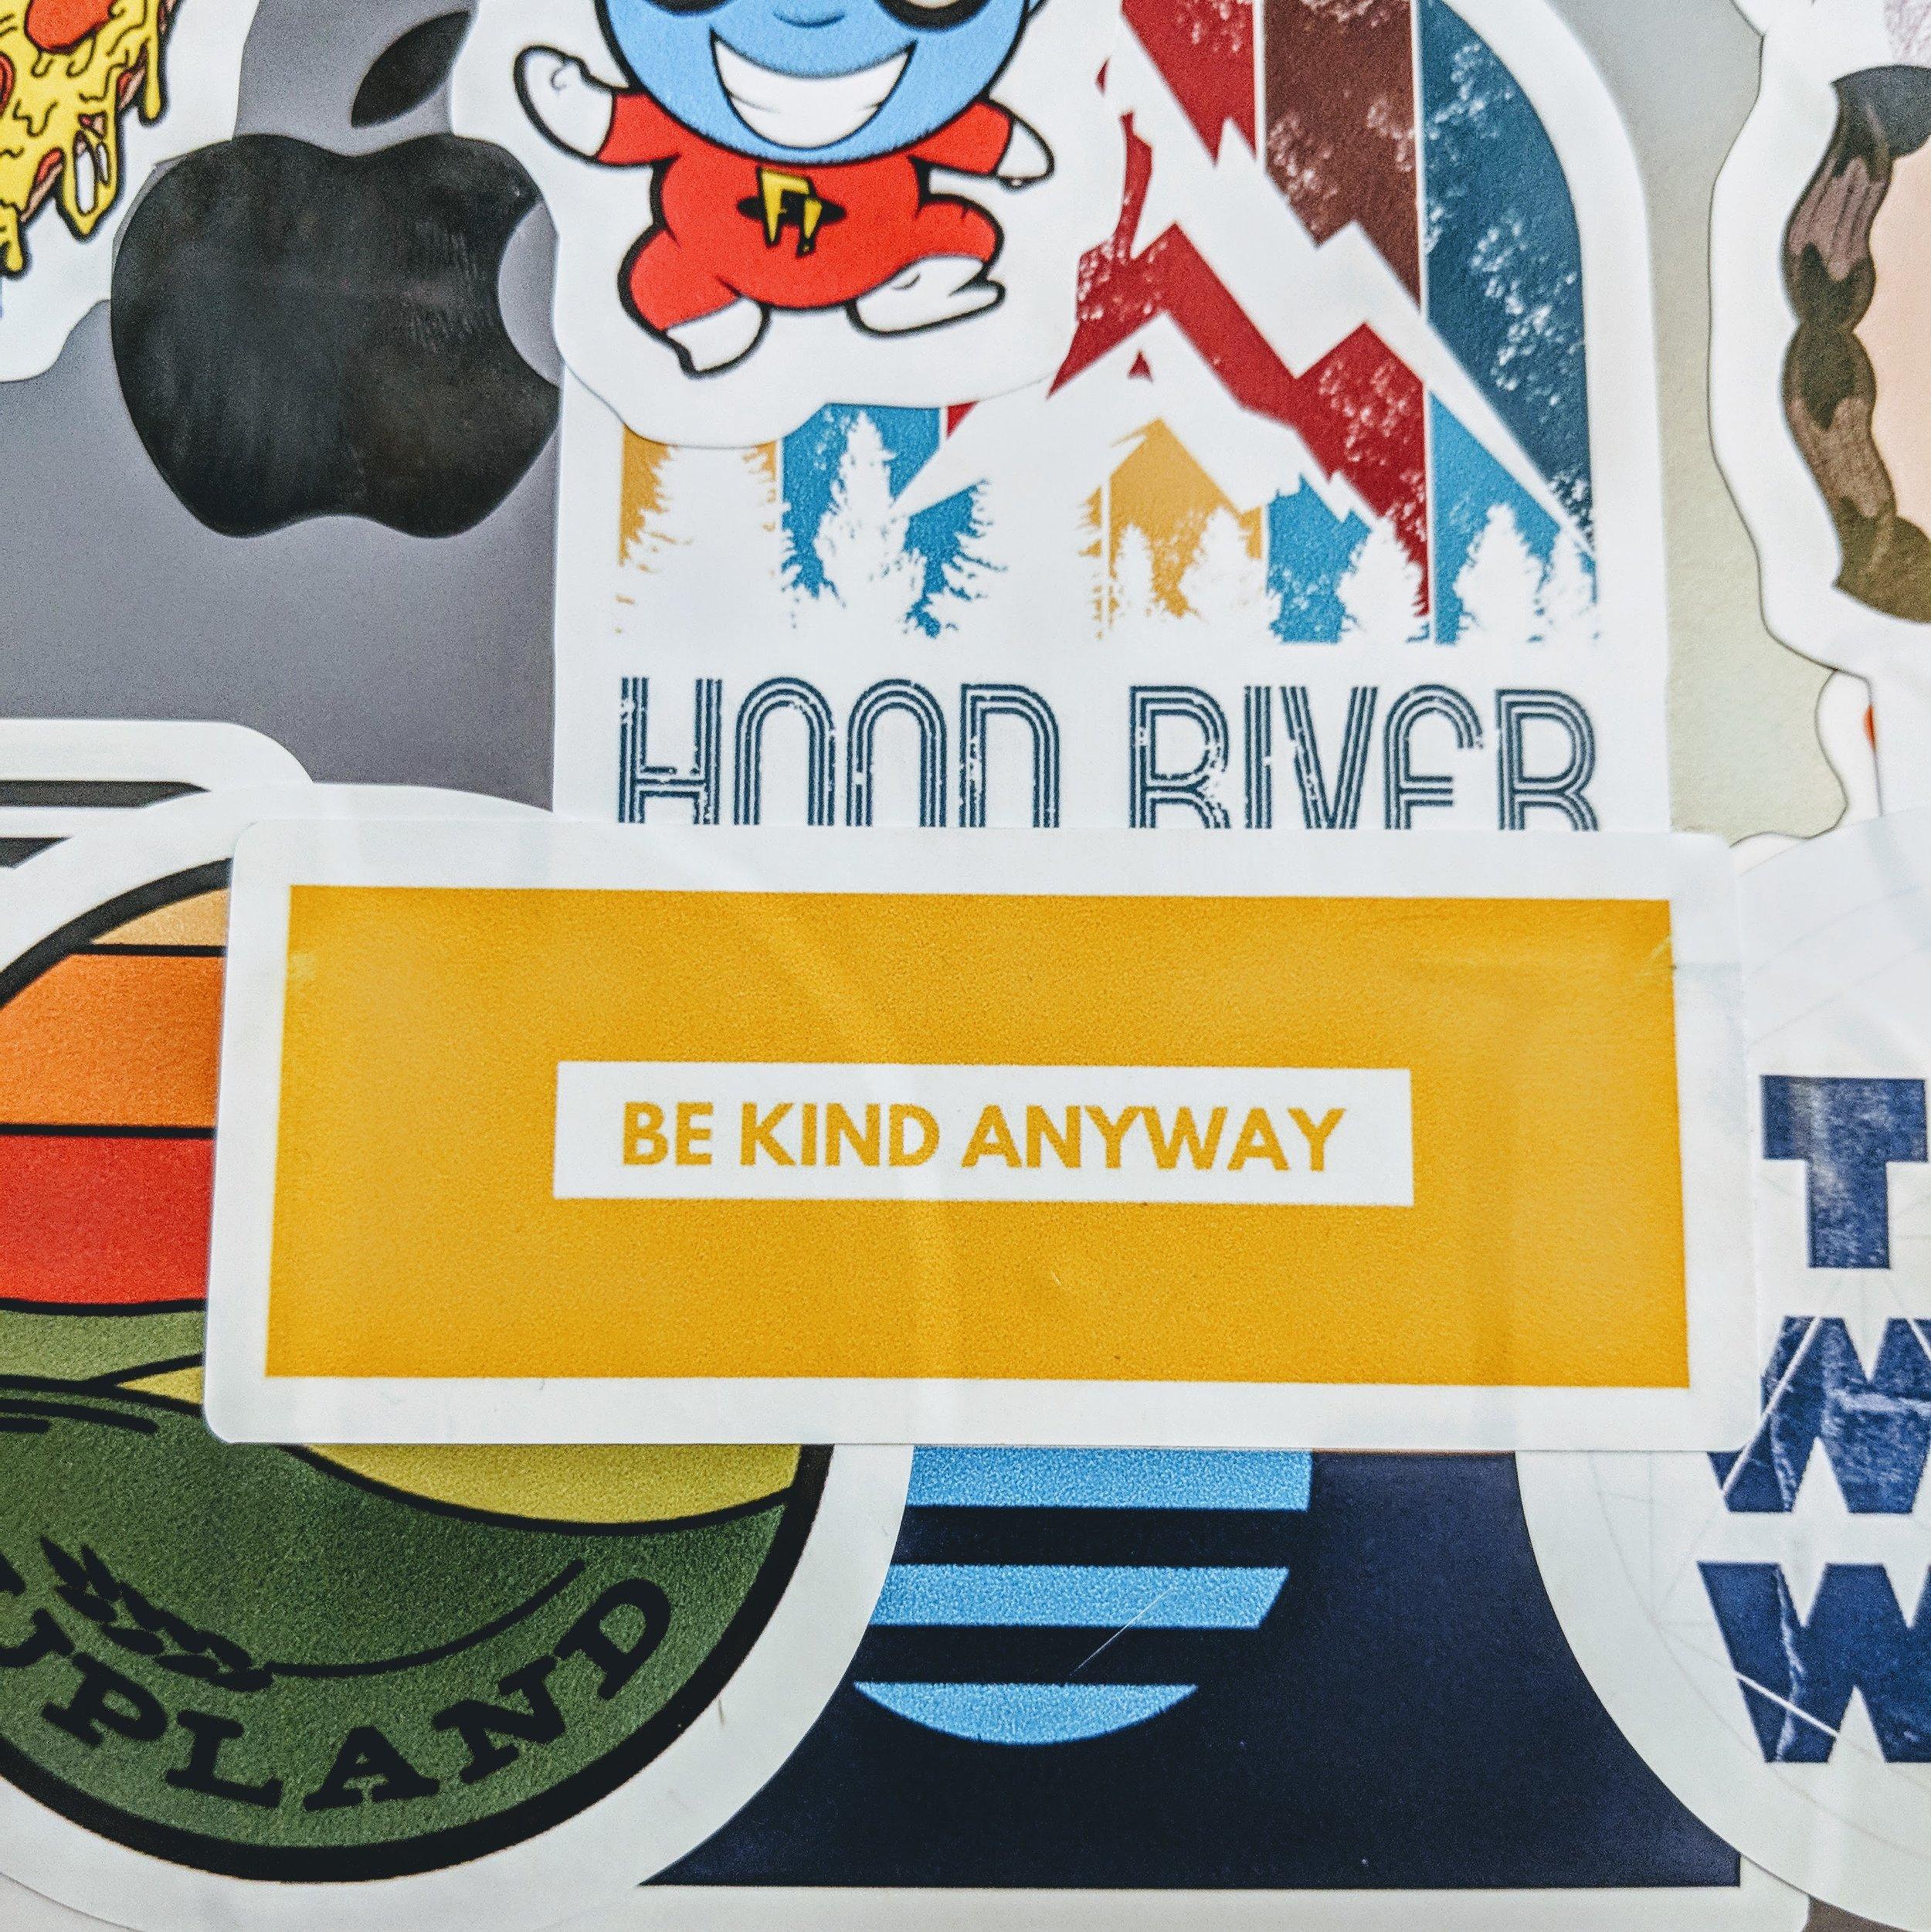 be kind anyway.jpg